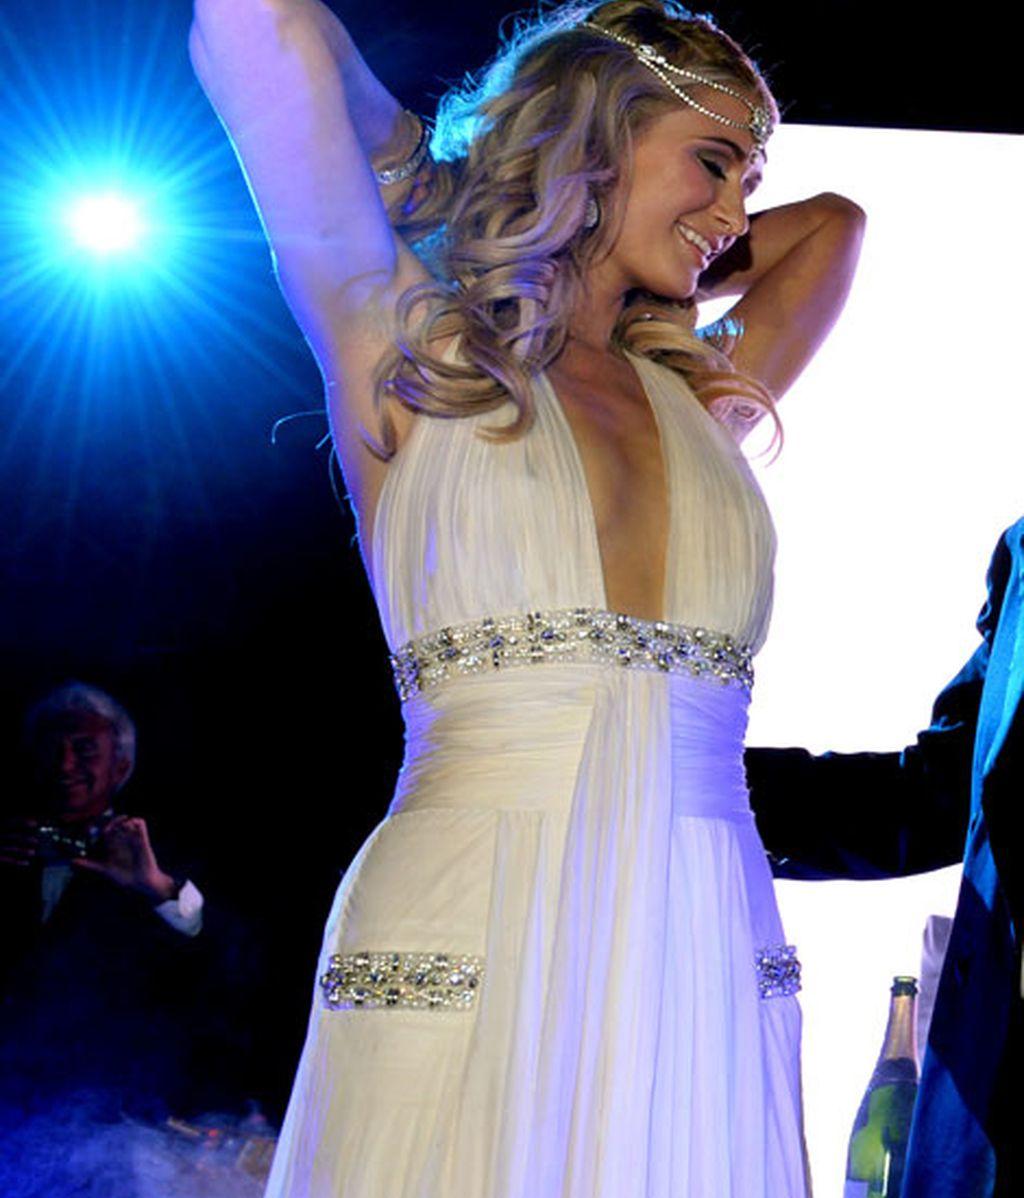 Paris Hilton bailó durante toda la fiesta